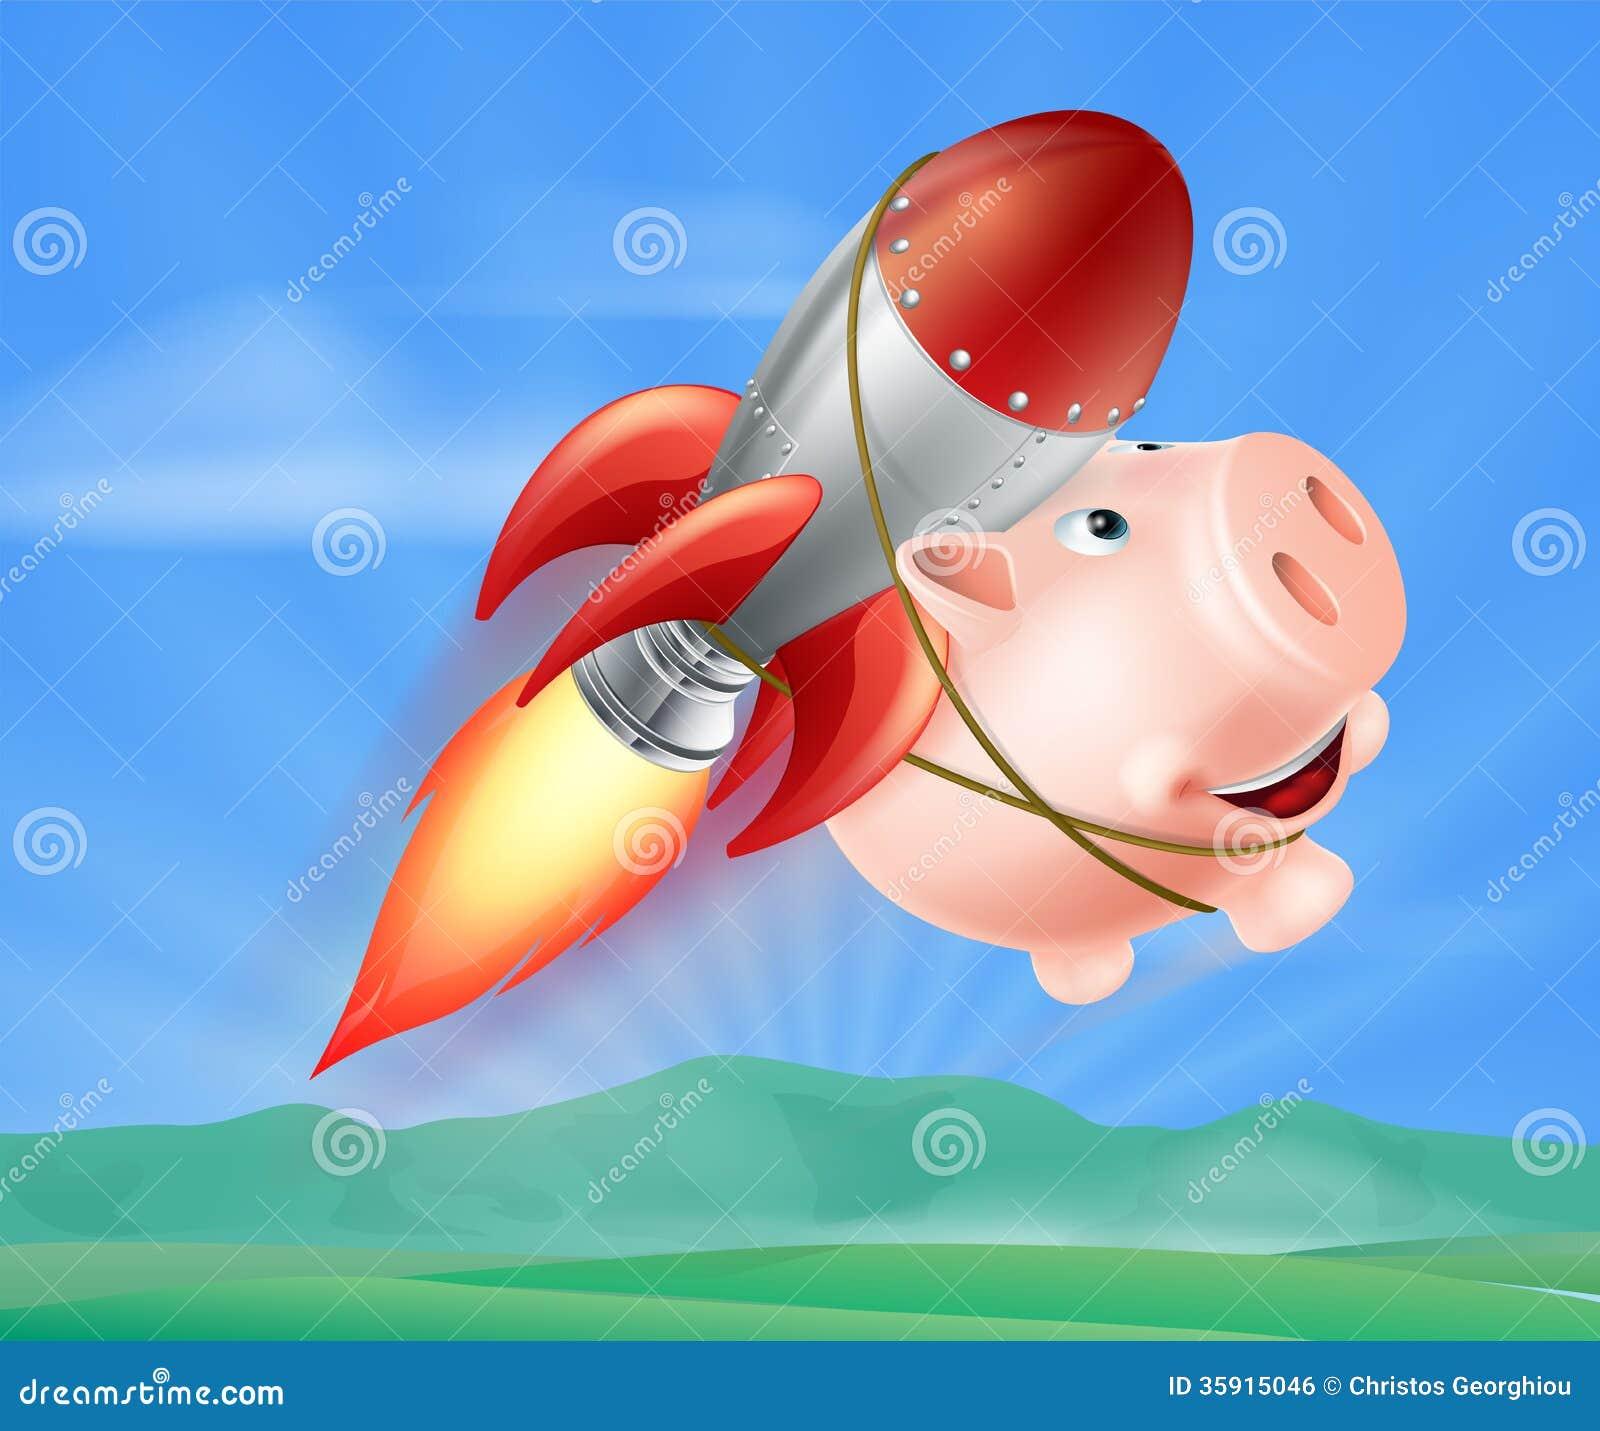 Flying rocket piggy bank royalty free stock image image 35915046 - Rocket piggy bank ...